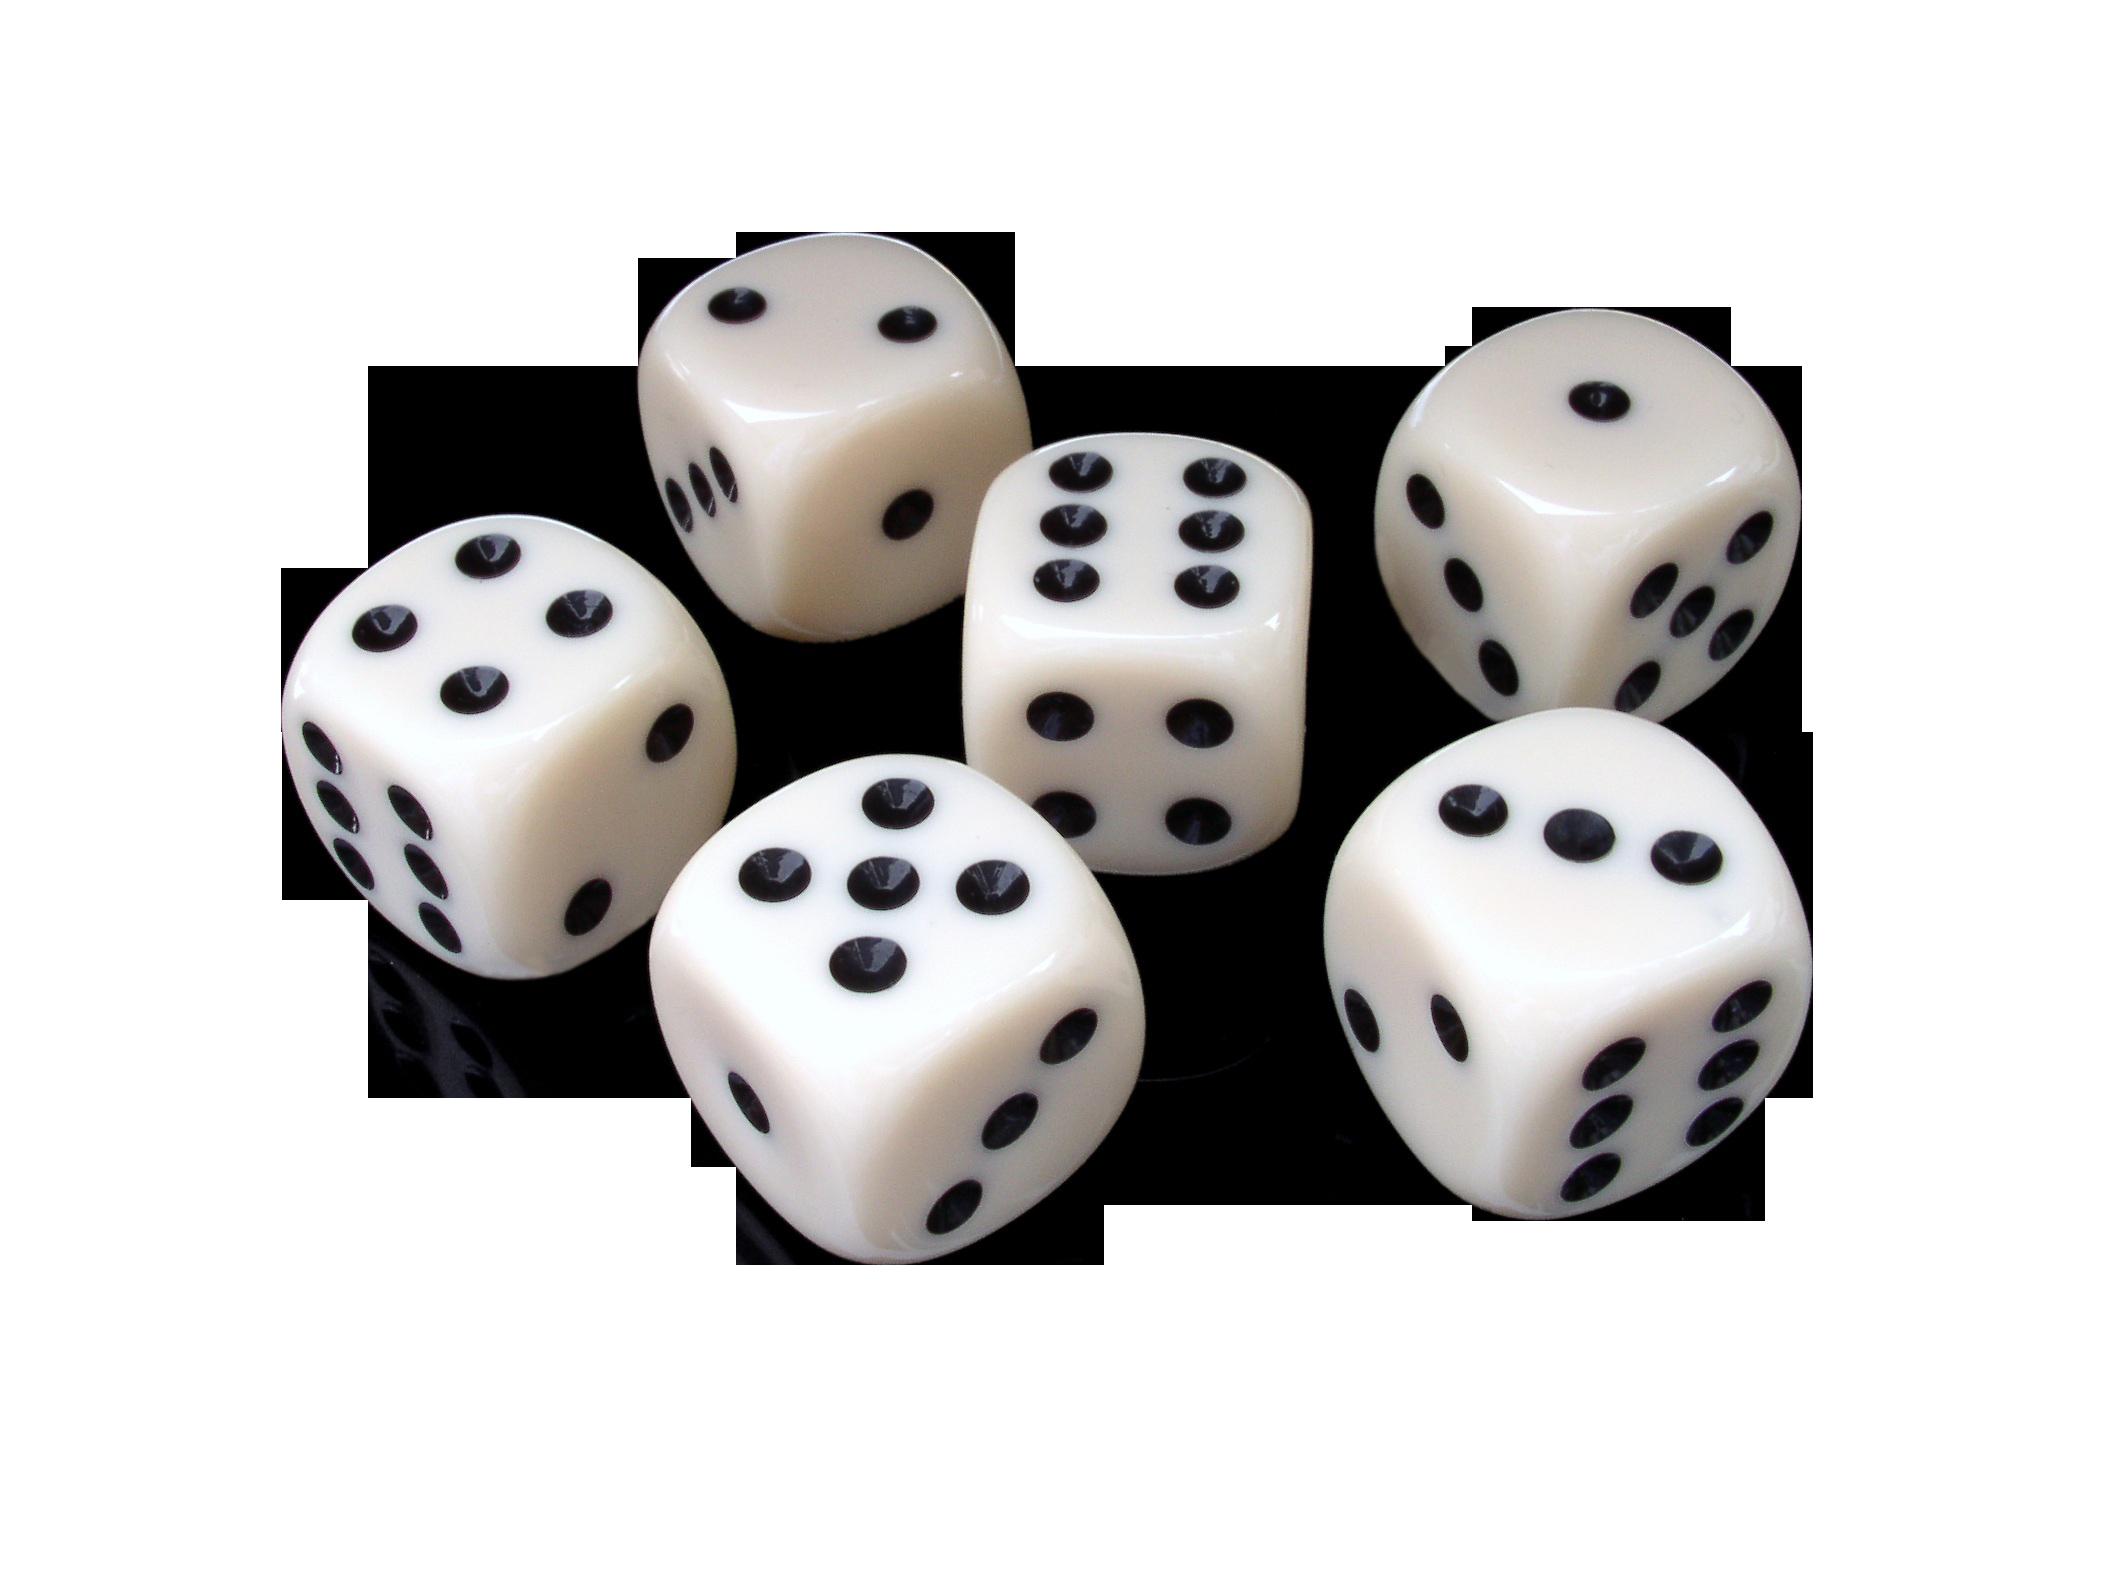 cube-689619_Clip